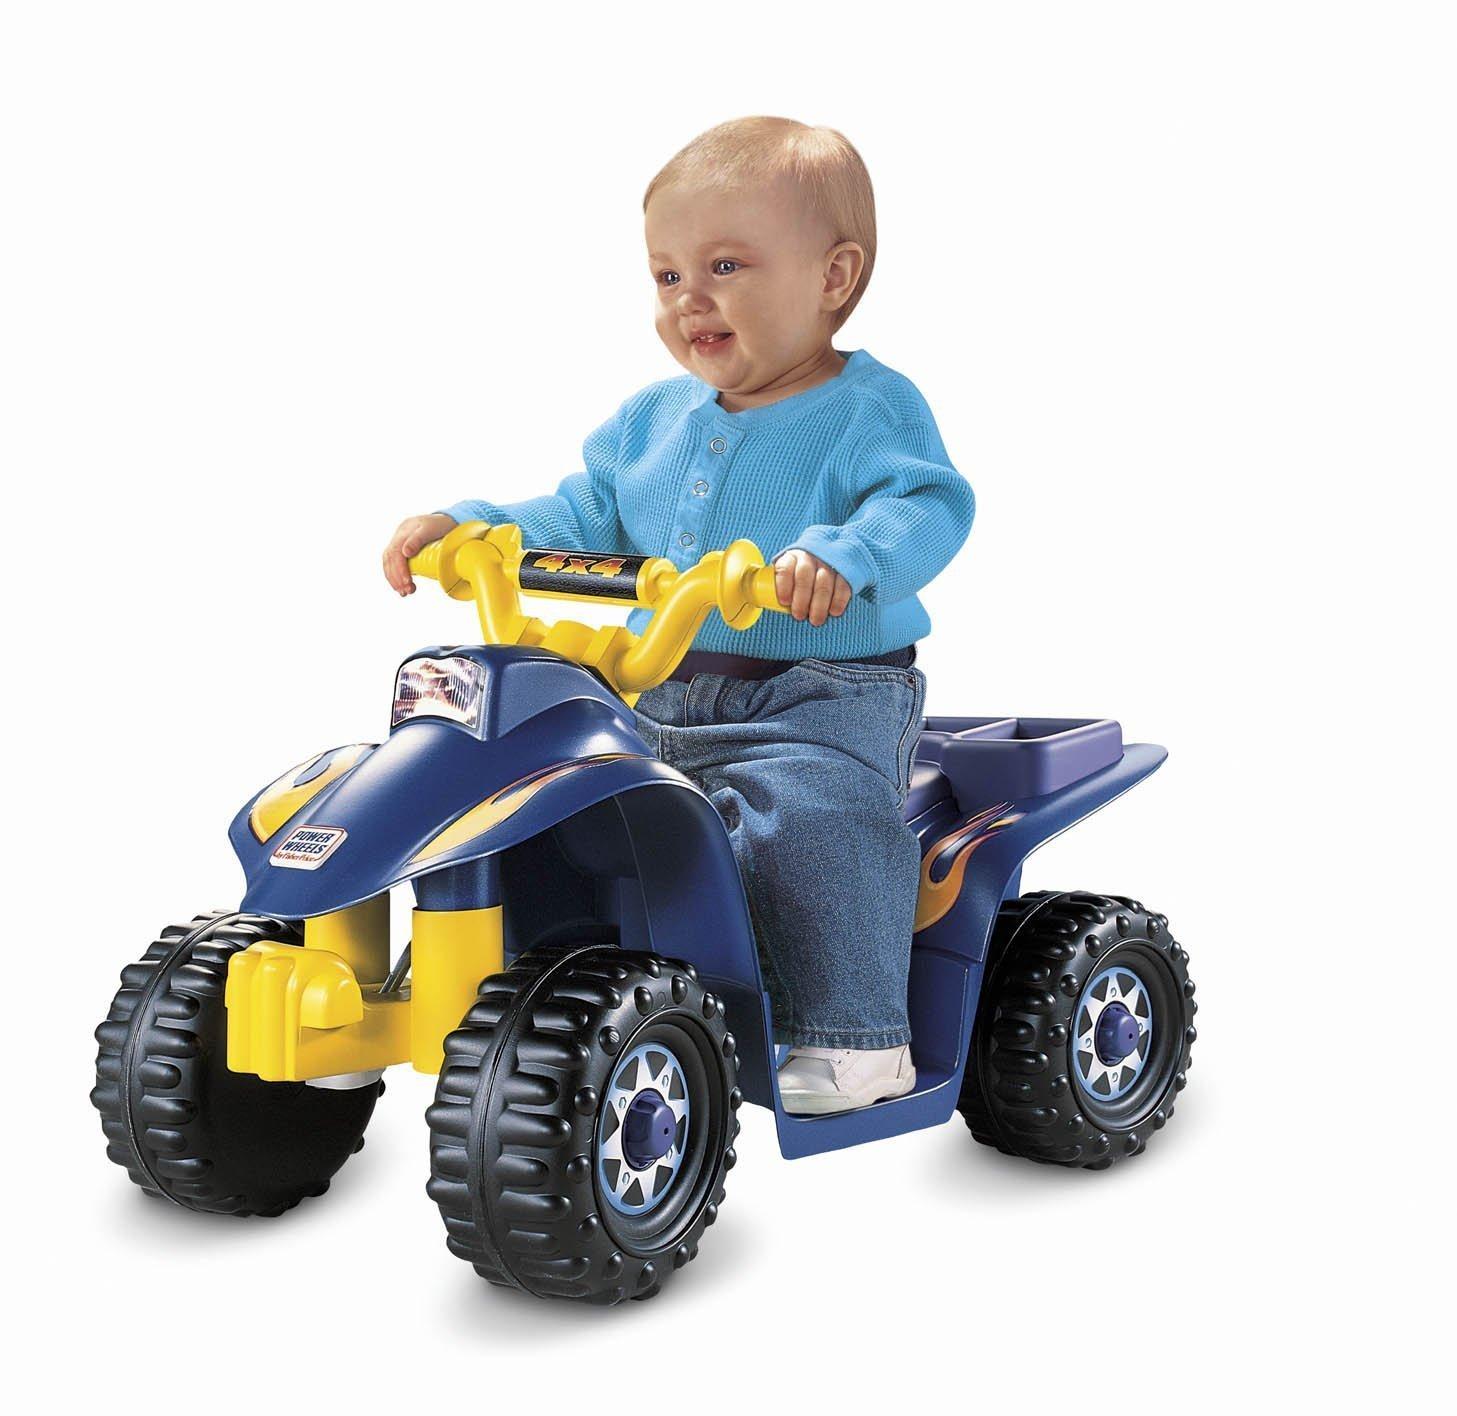 Amazon Up to 40% off Power Wheels toys Money Saving Mom